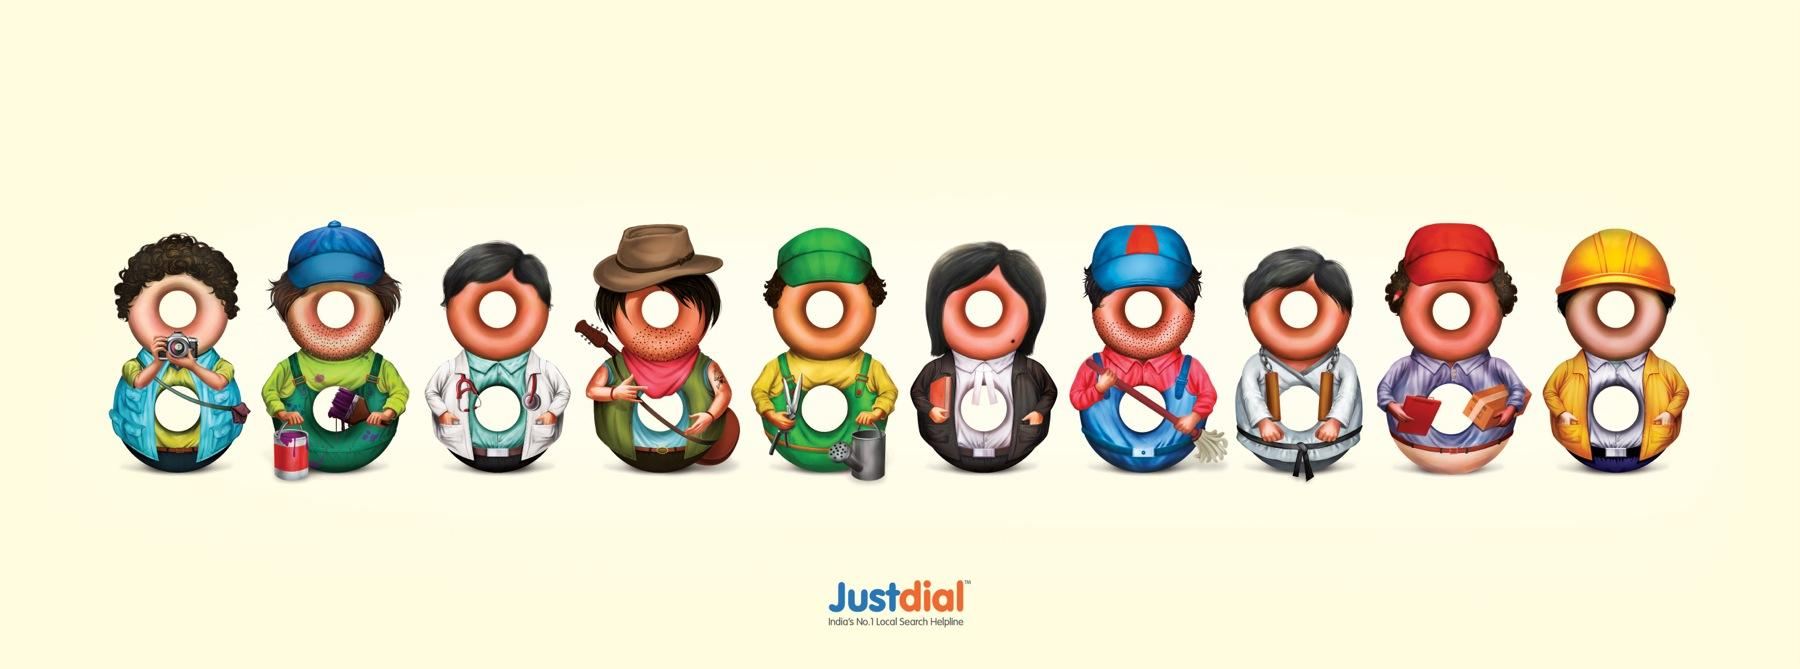 Justdial Print Ad -  Professionals, 2